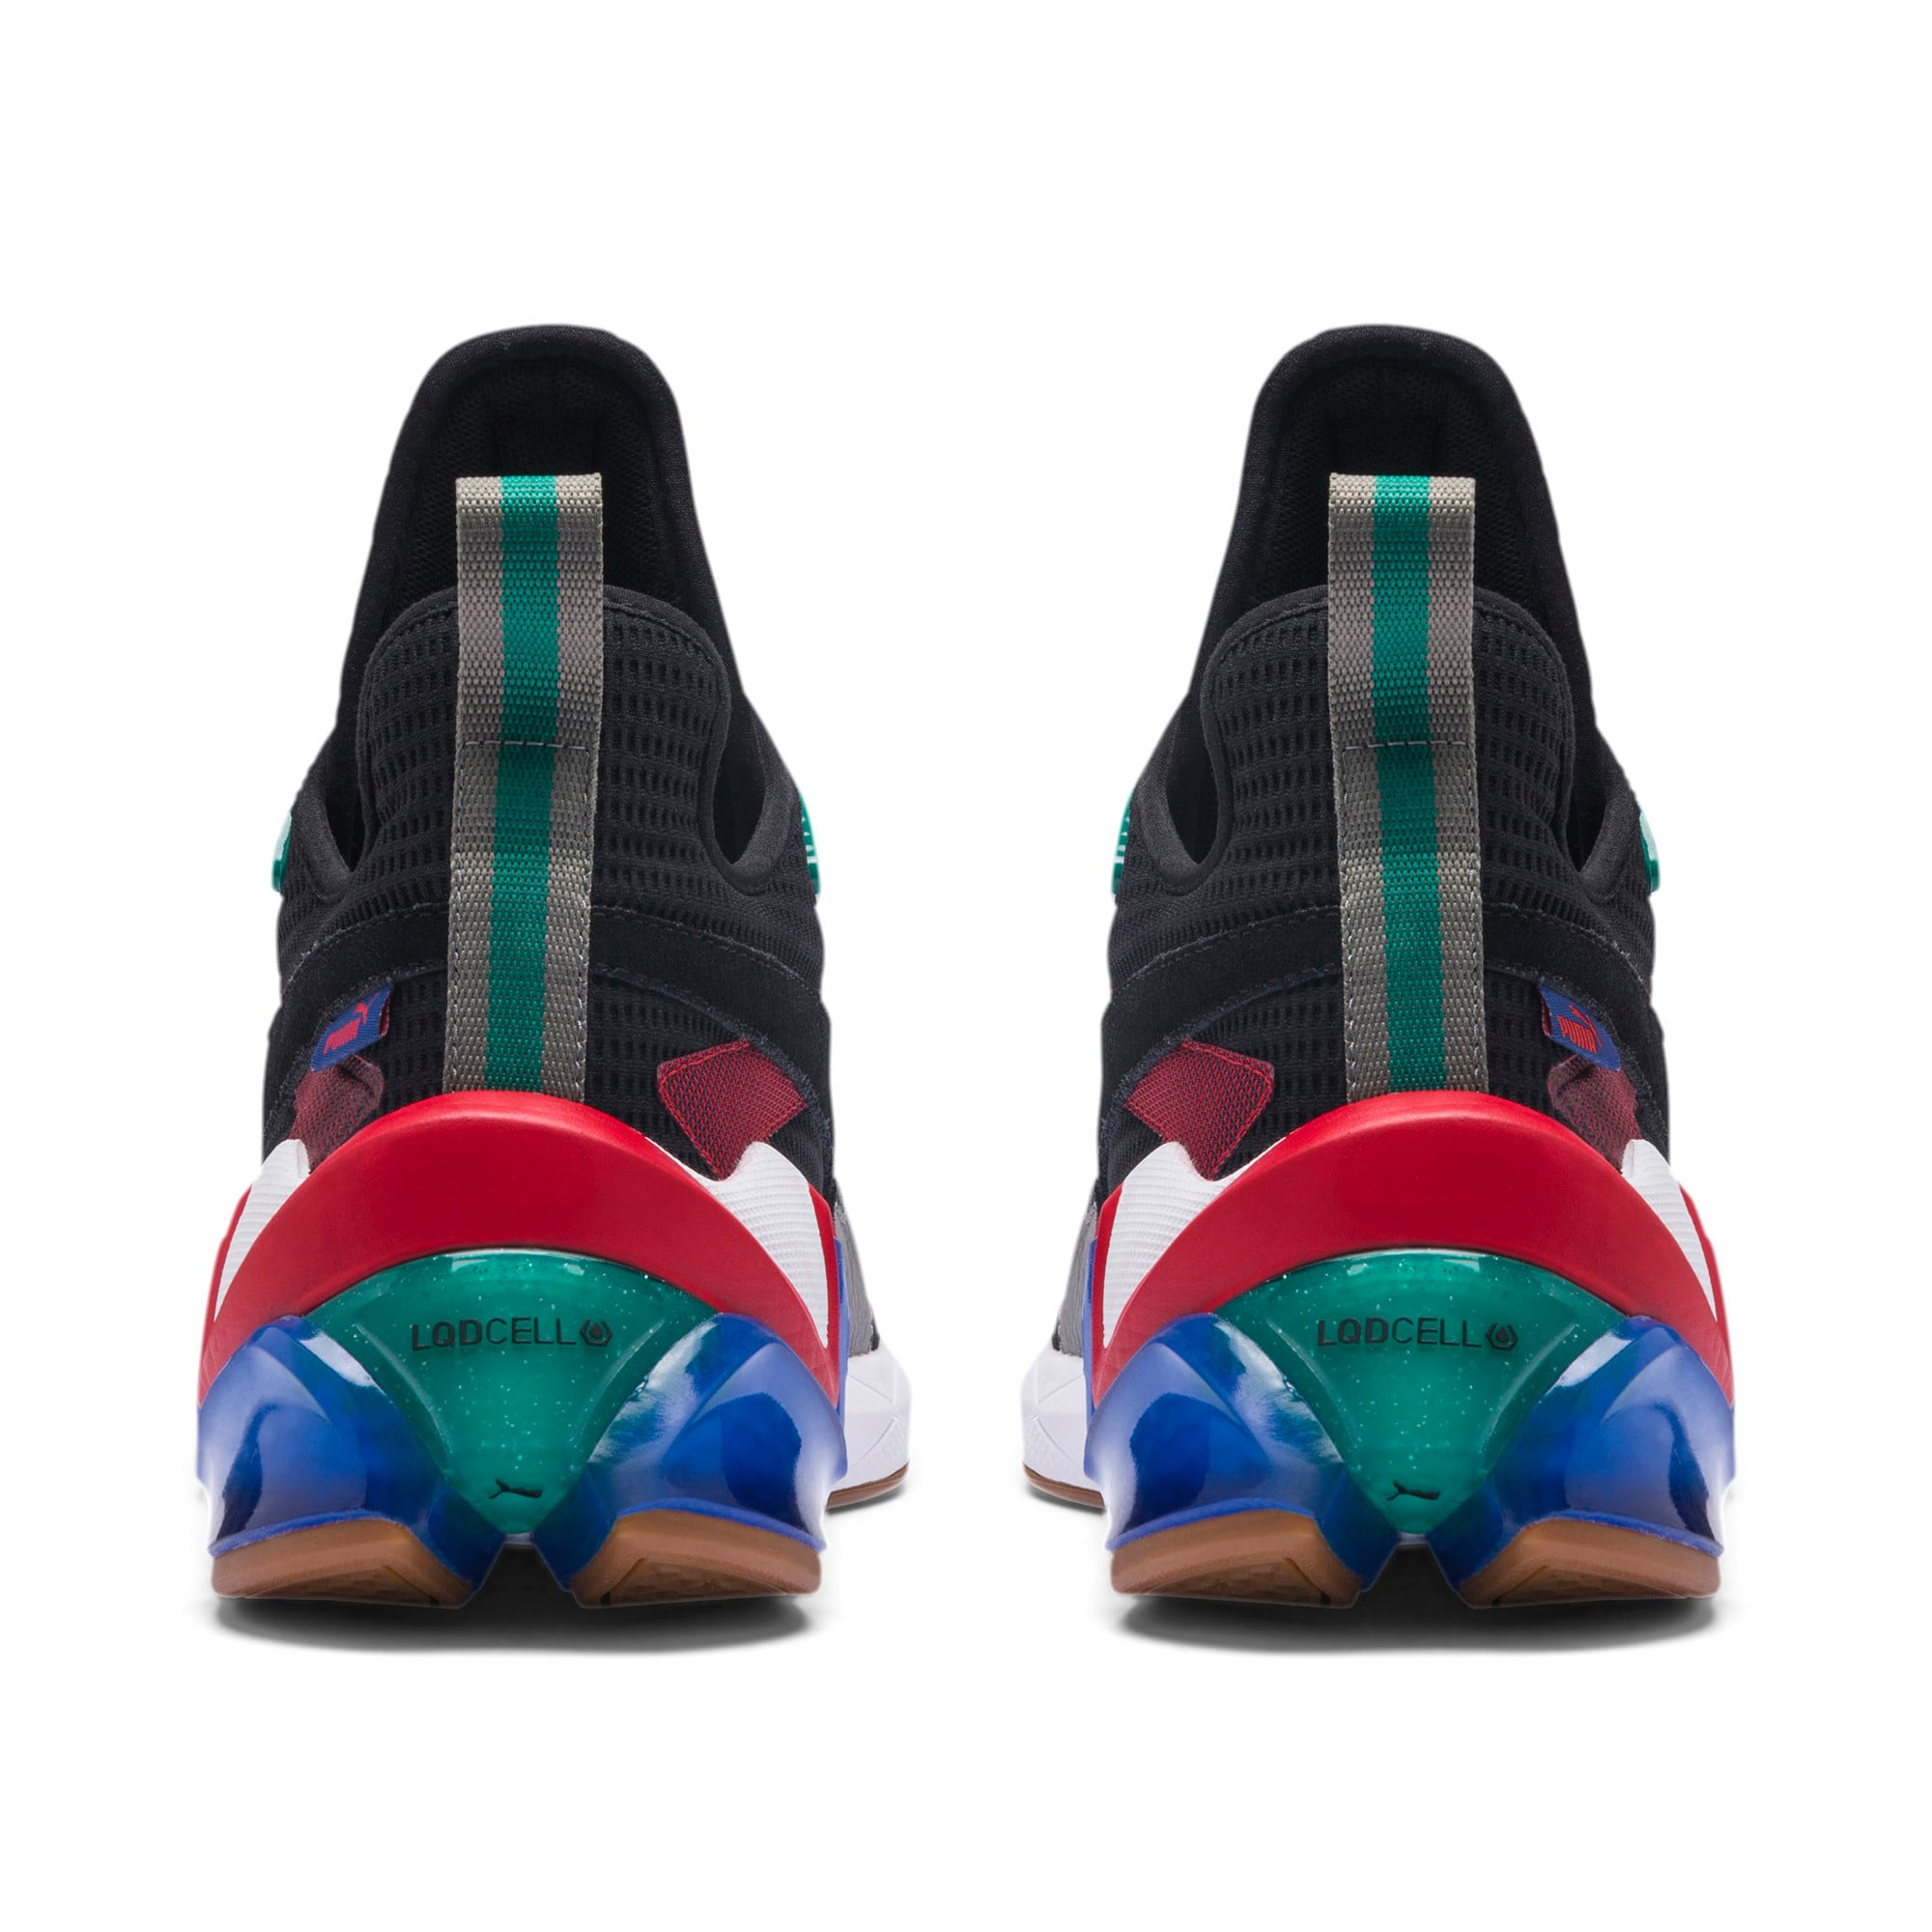 Thumbnail 3 of LQDCELL Origin Men's Training Shoes, Puma Black-Cadmium Green, medium